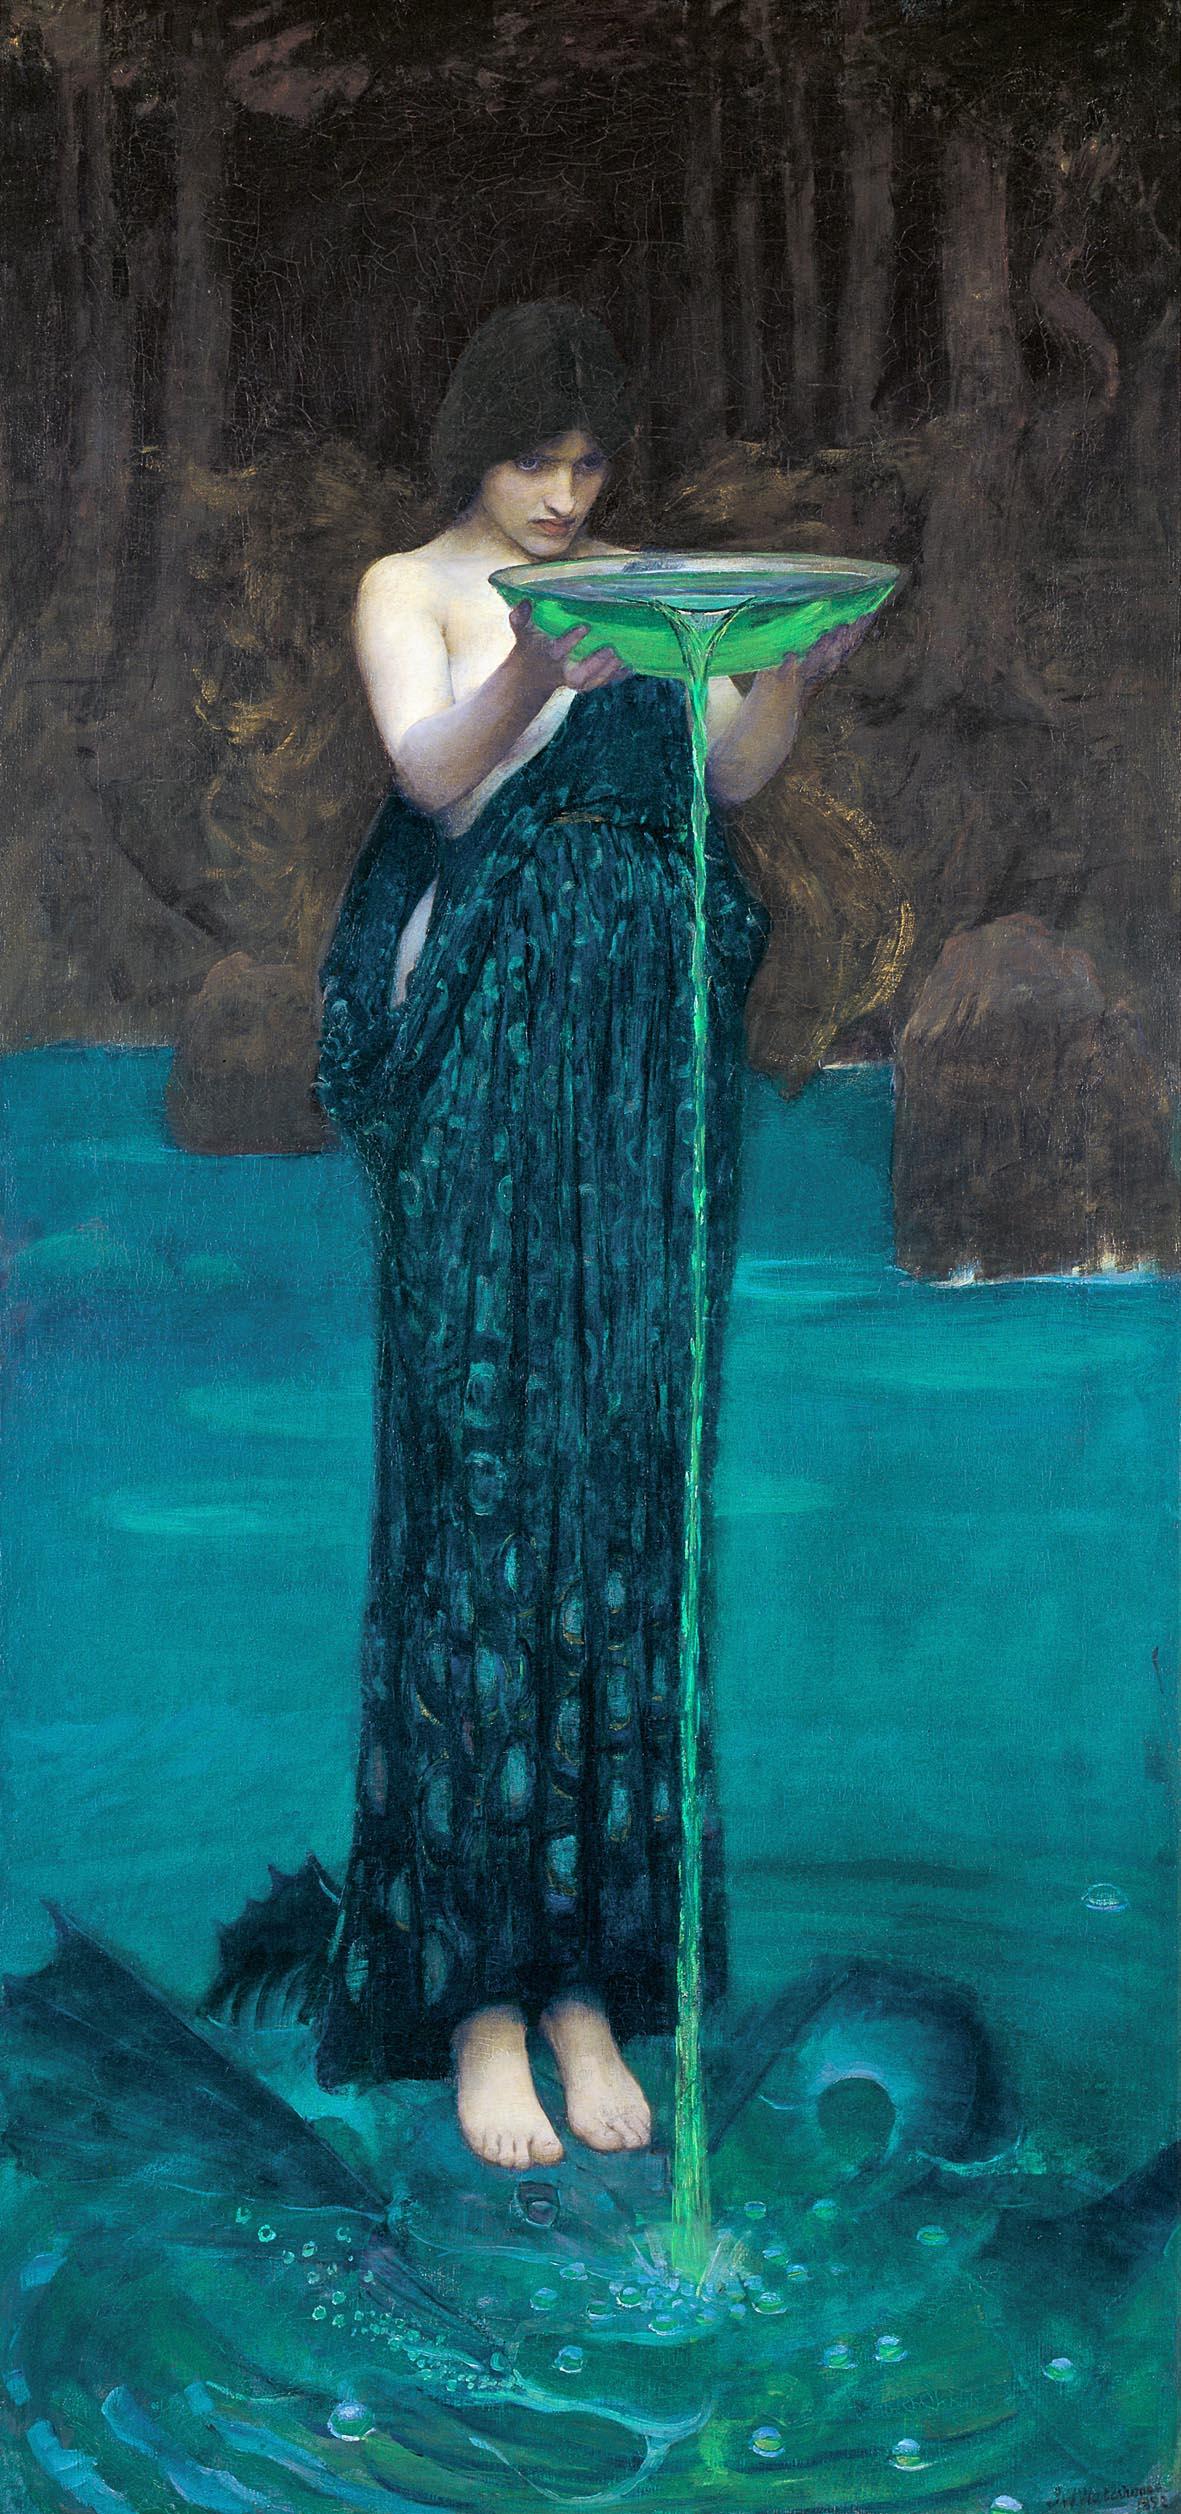 John W. Waterhouse, Circe invidiosa (1892; olio su tela, 180,7 x 87,4 cm; Adelaide, Art Gallery of South Australia)